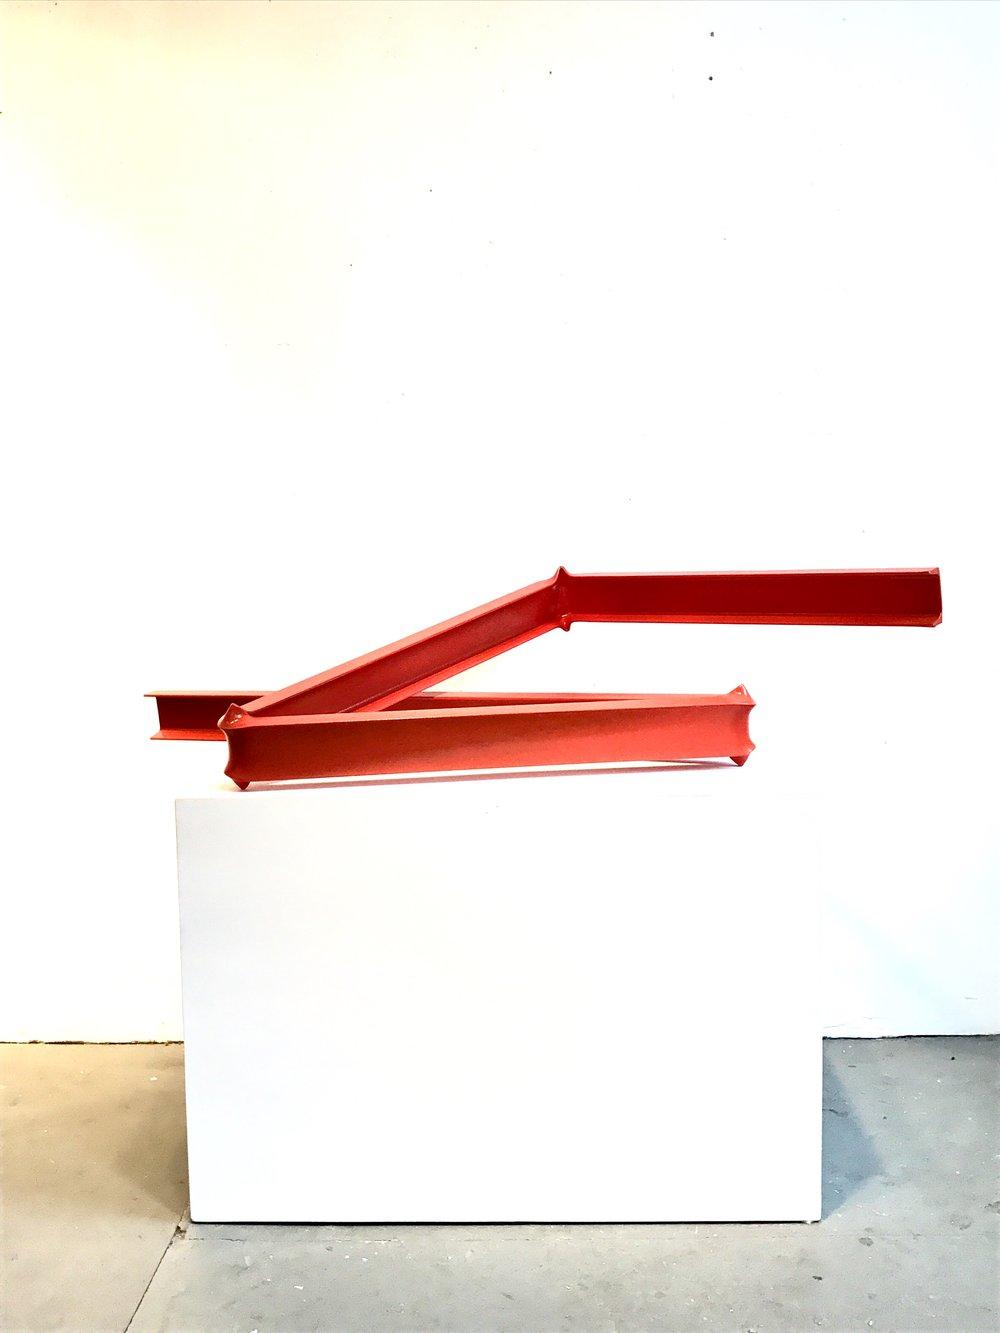 Powder coated bent steel. 4' x 2' x 1' $2500